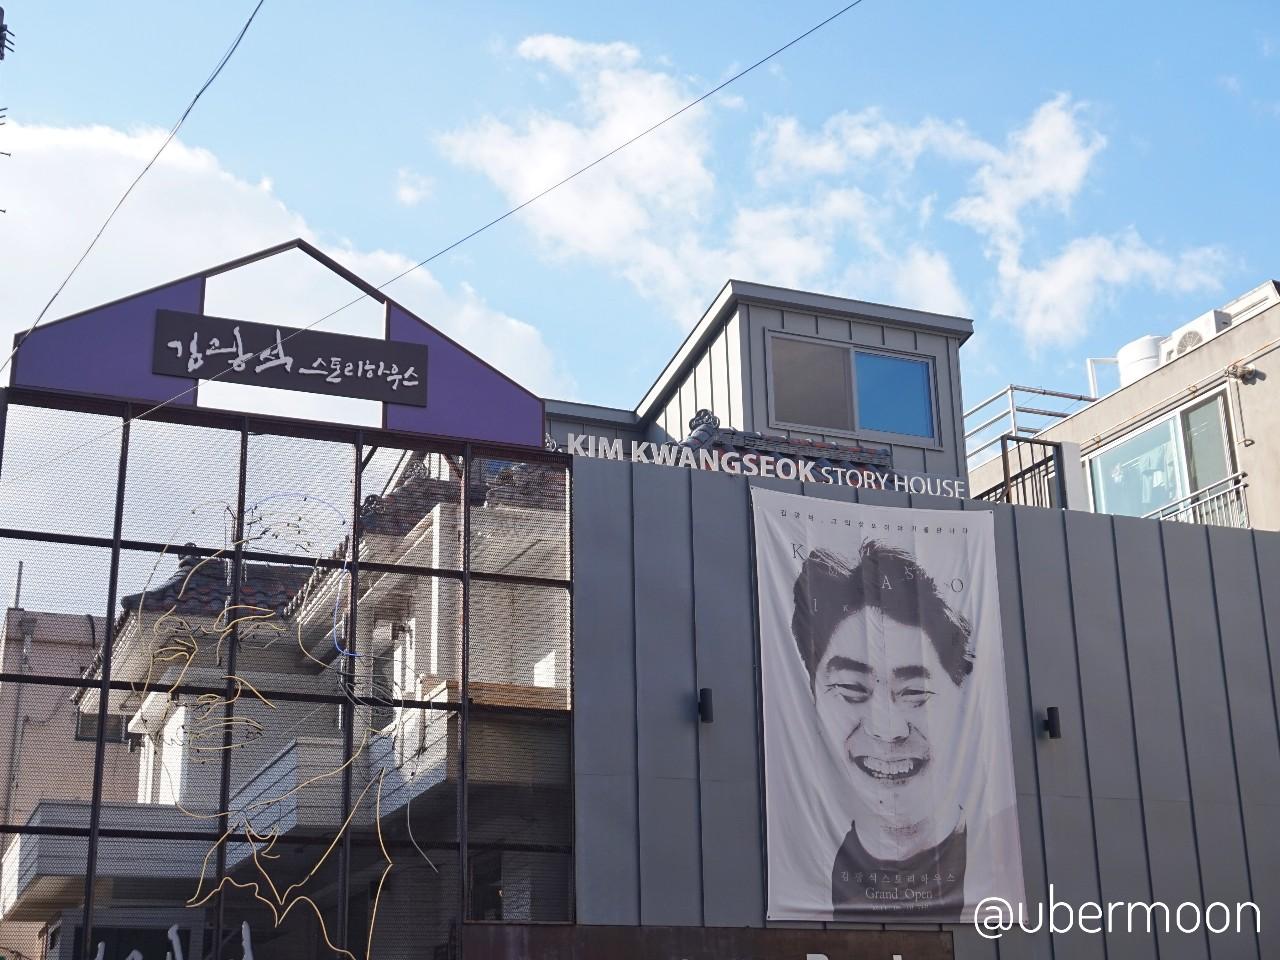 Kim Kwang Seok Story House